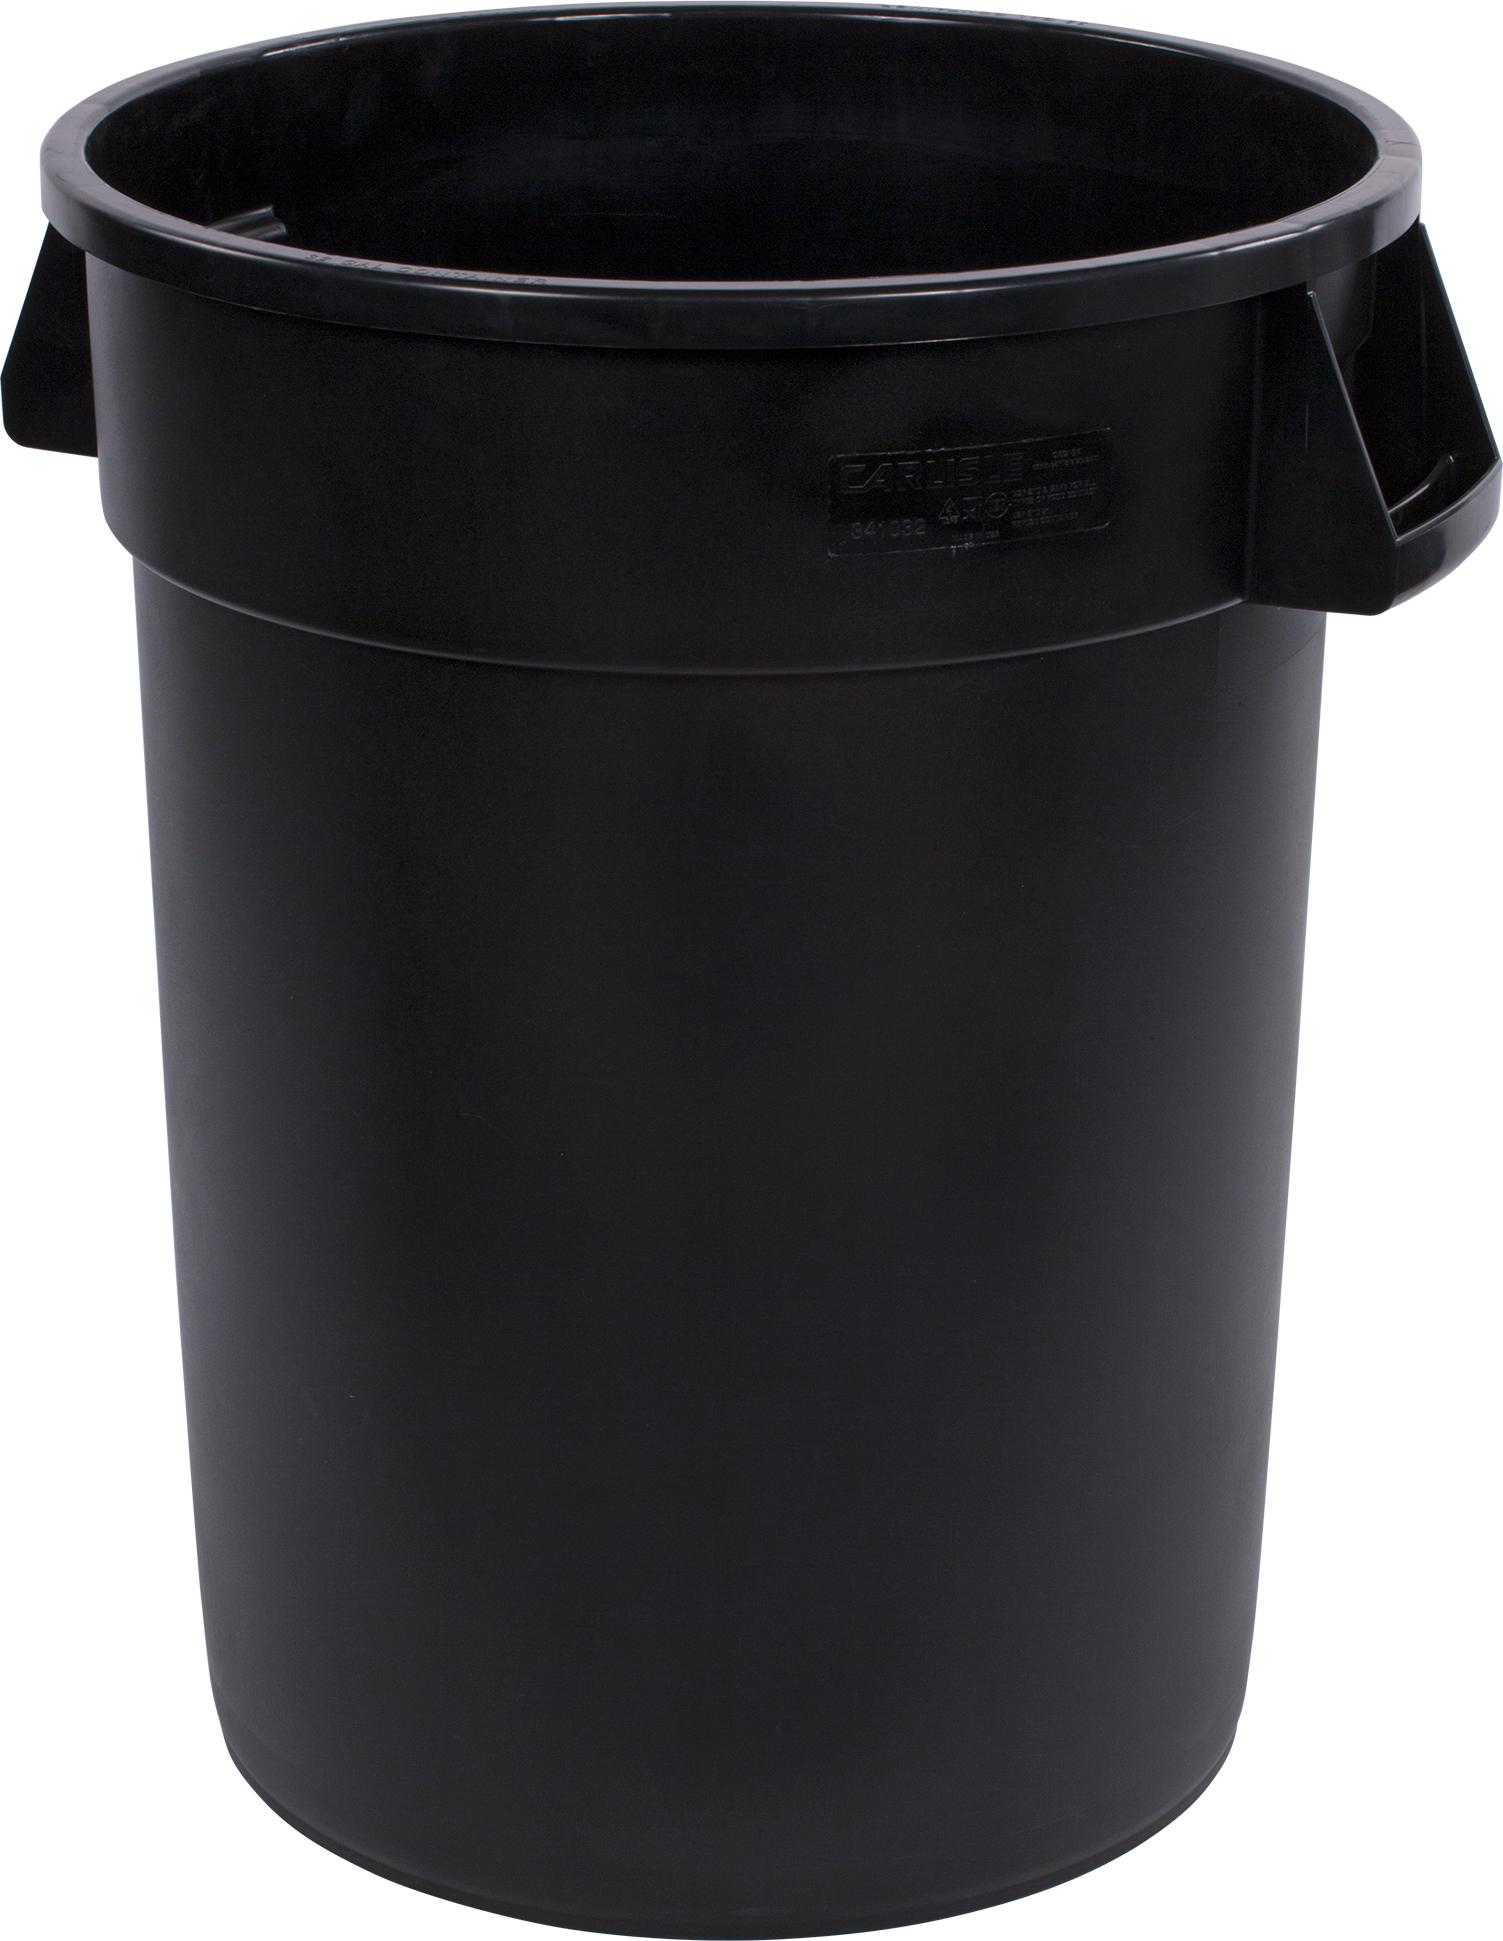 Bronco Round Waste Bin Trash Container 32 Gallon - Black